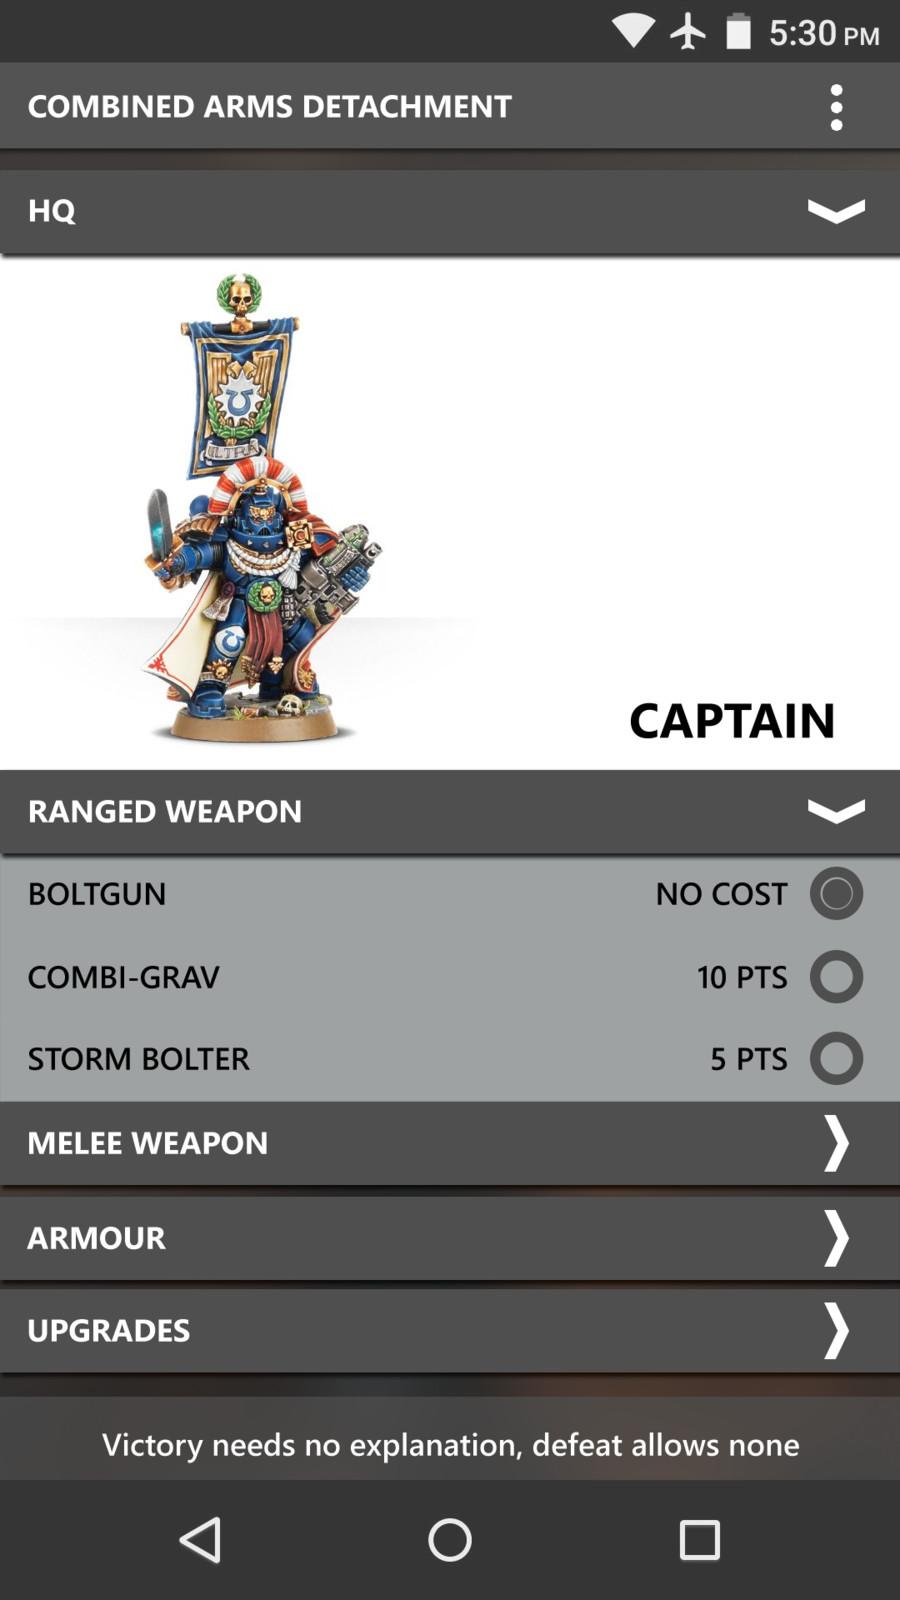 Captain Breakdown